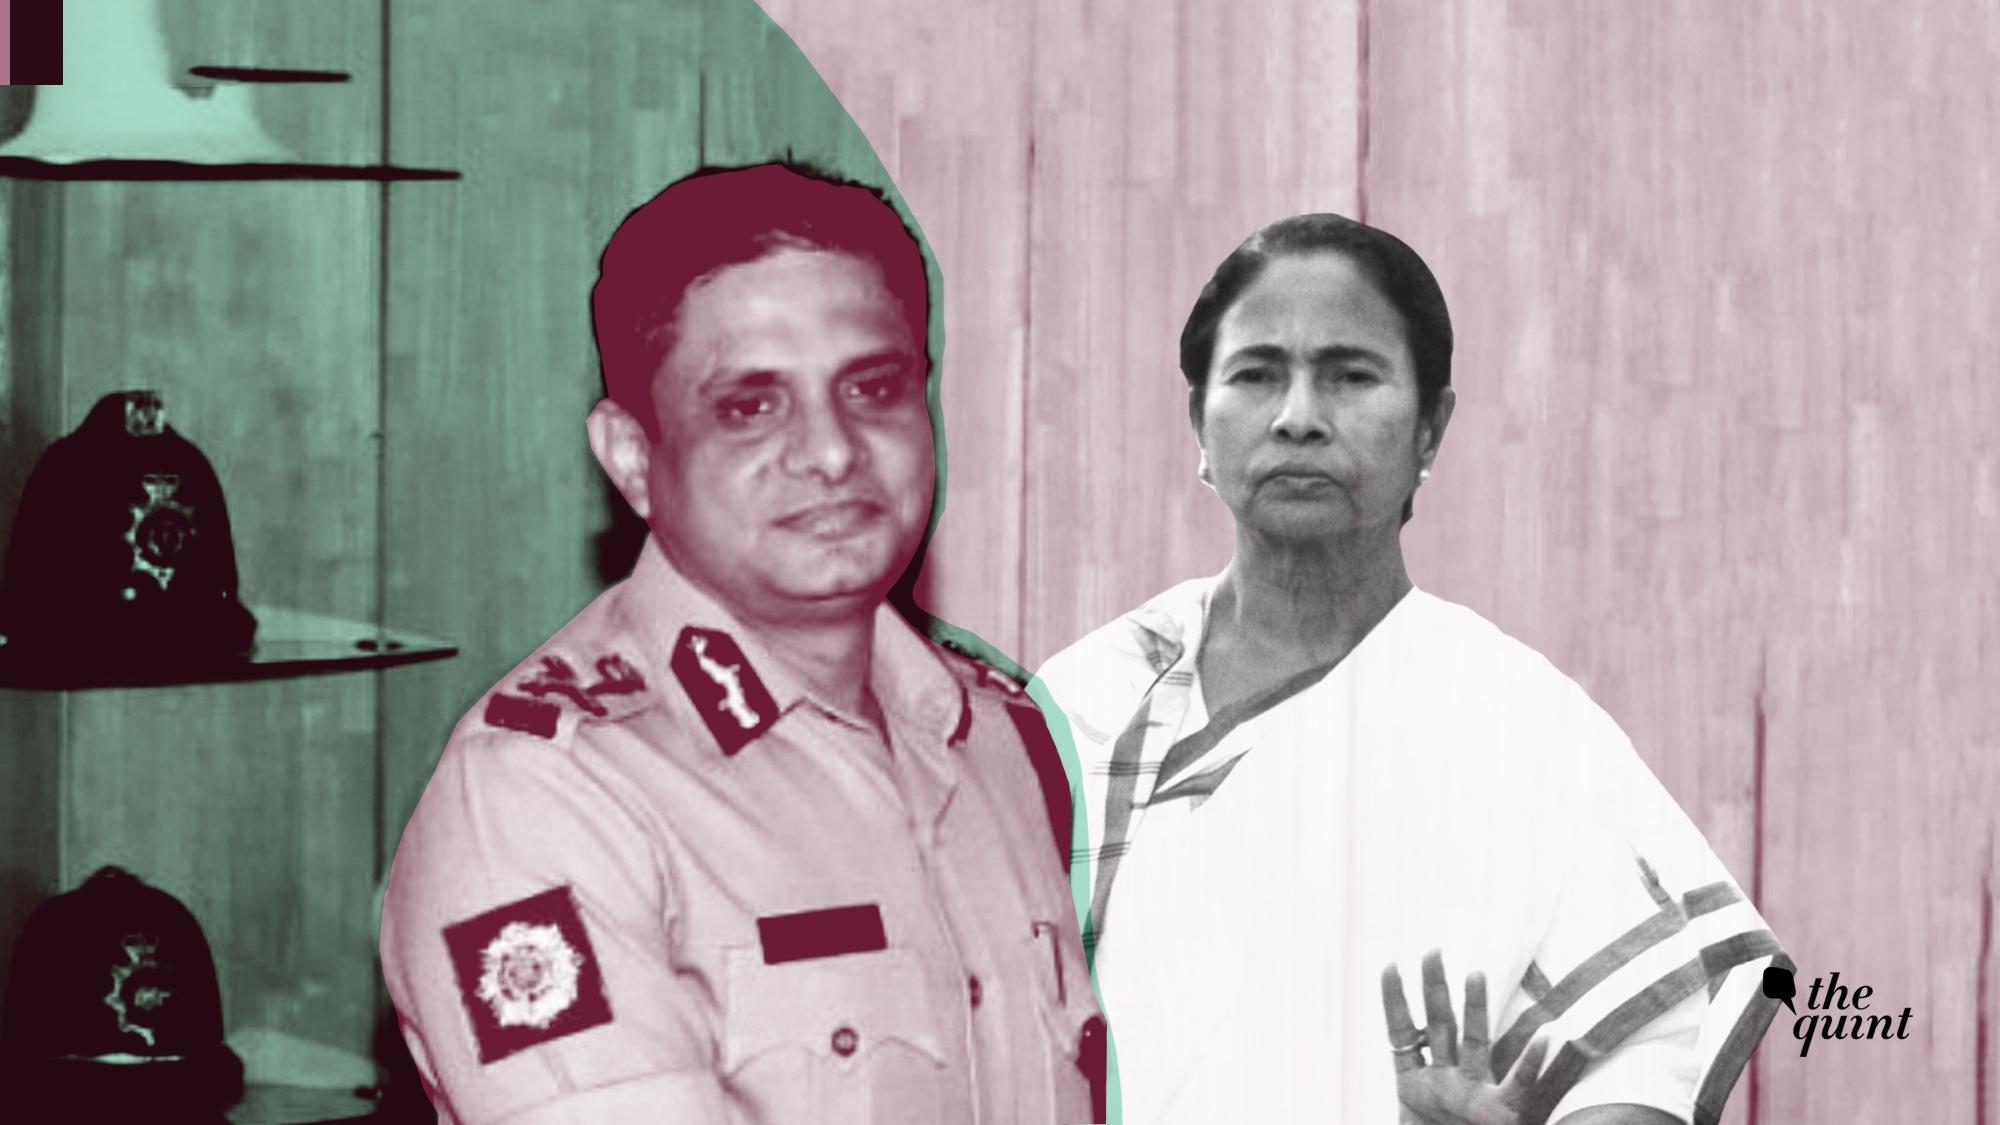 HC Begins Hearing Plea of Former Kolkata Top Cop Rajeev Kumar